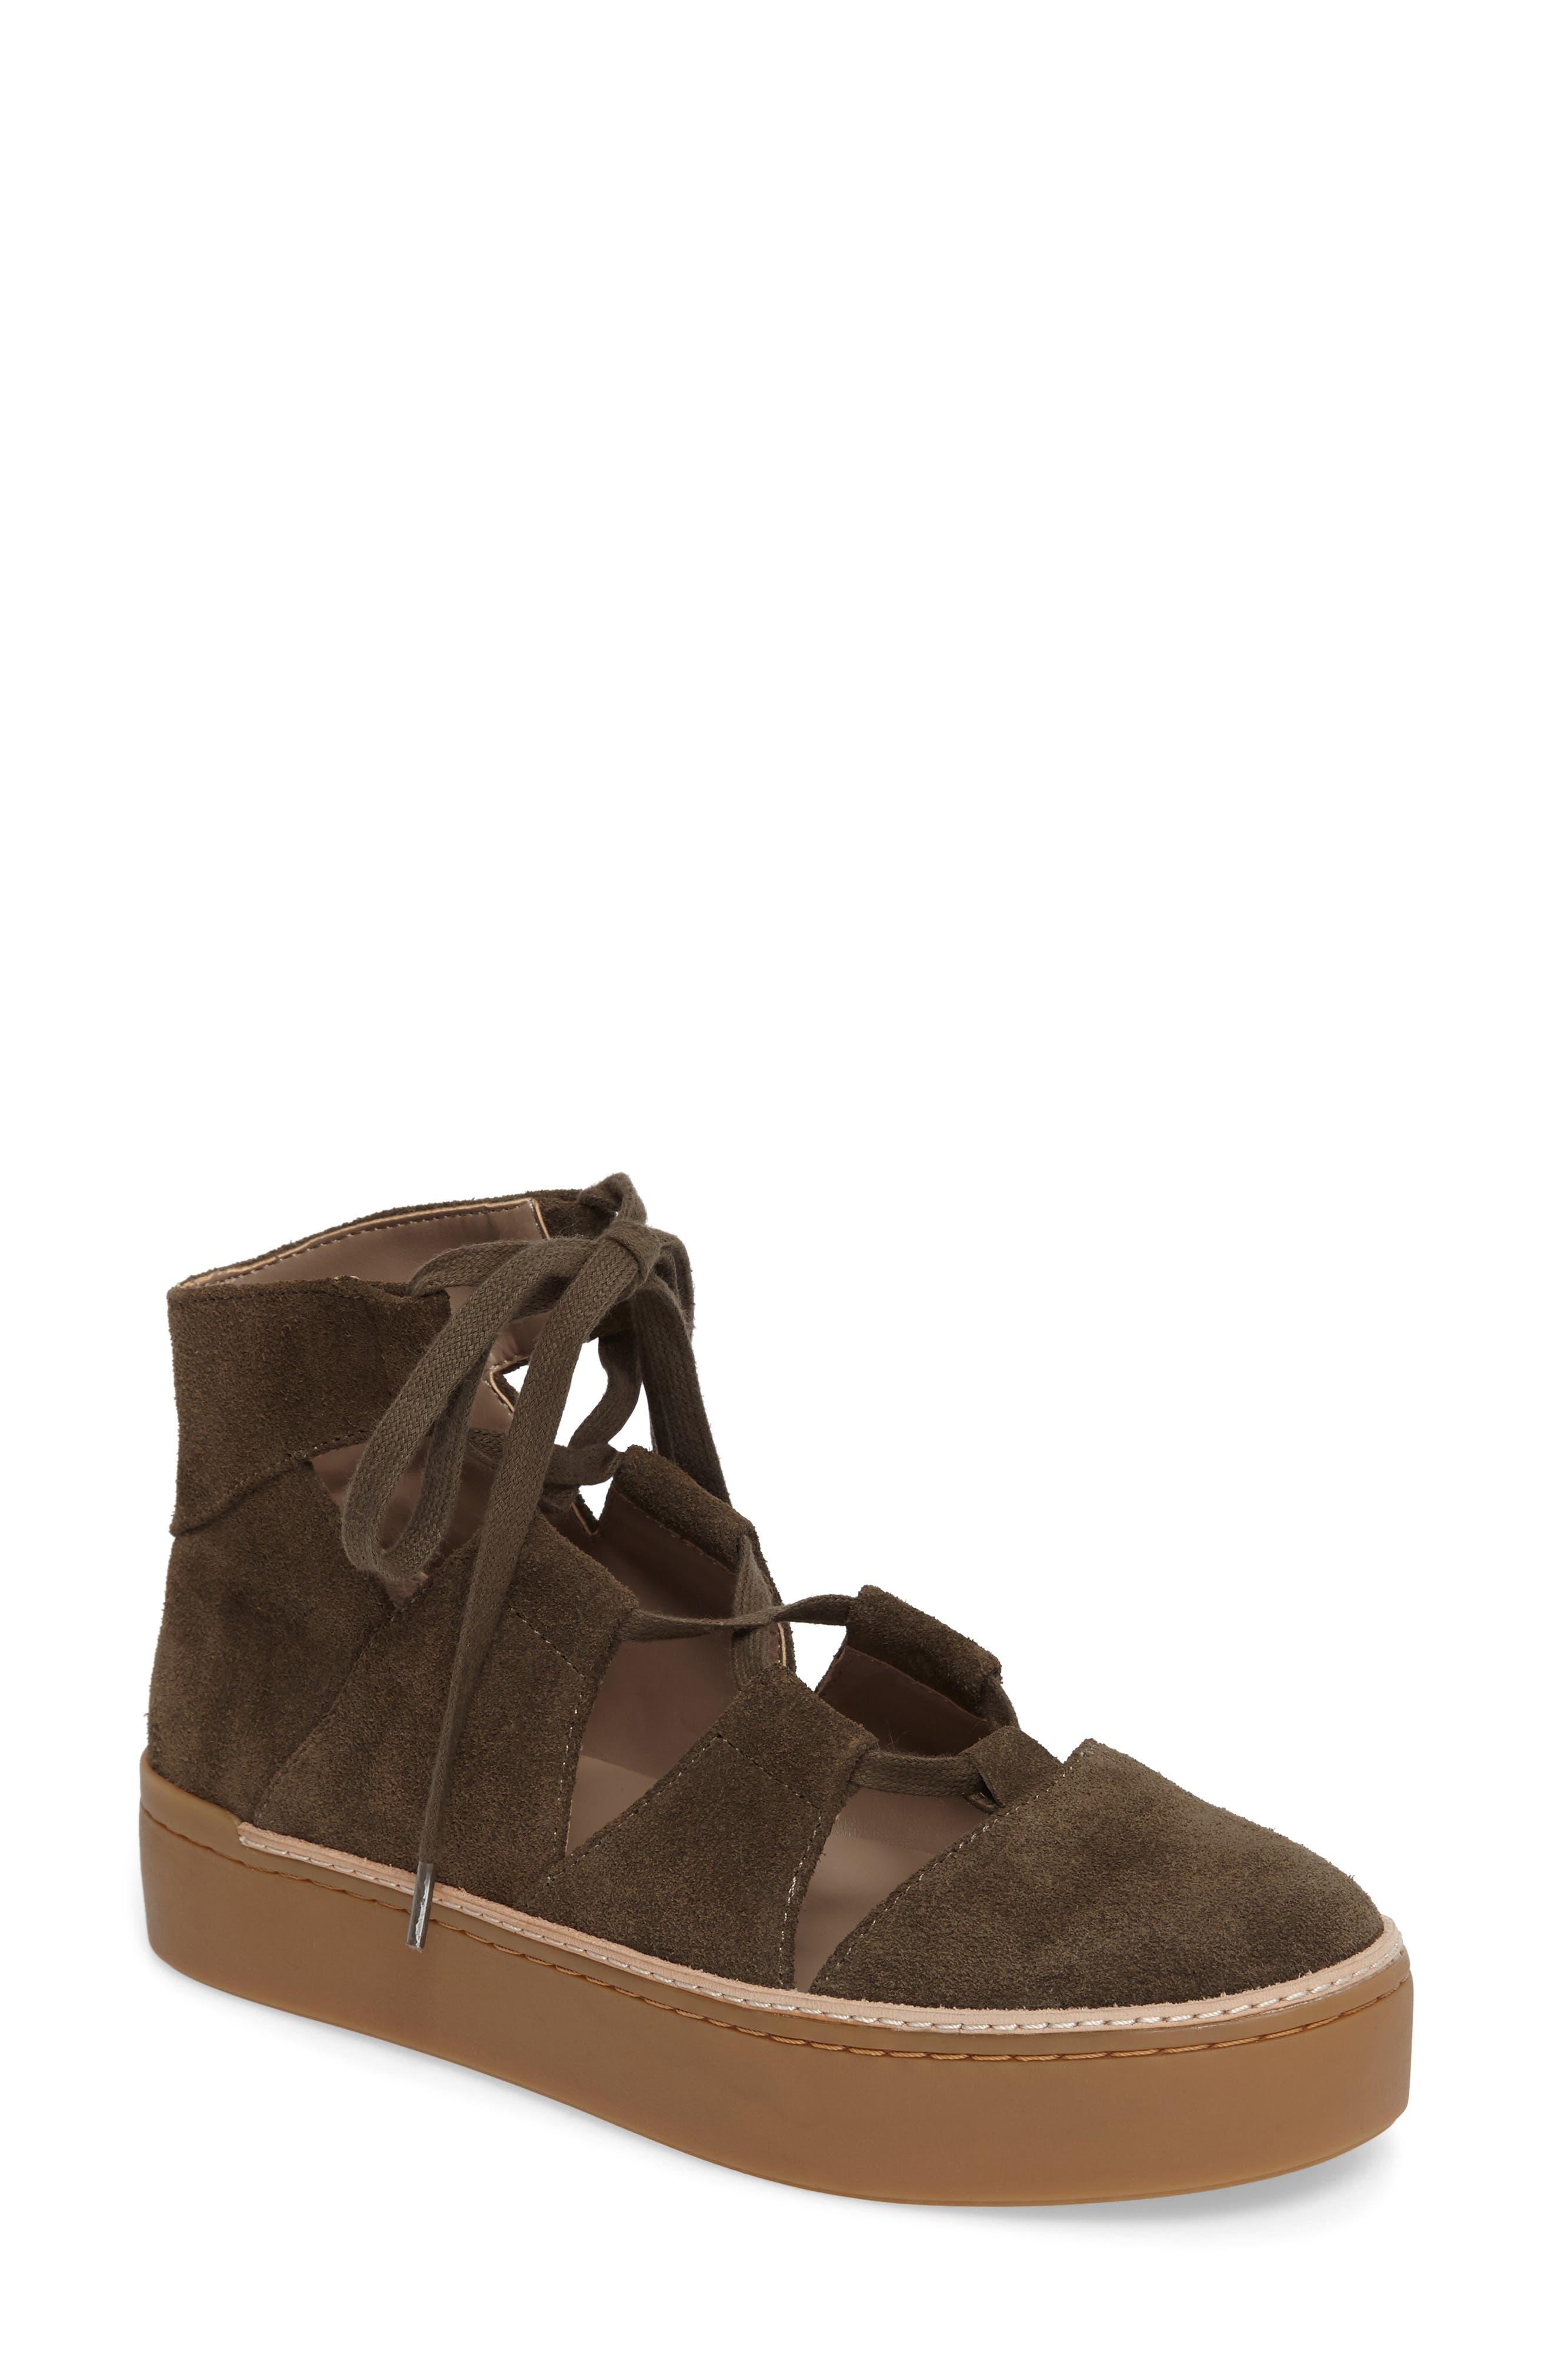 Alternate Image 1 Selected - M4D3 Savanah Ghillie Platform Sneaker (Women)